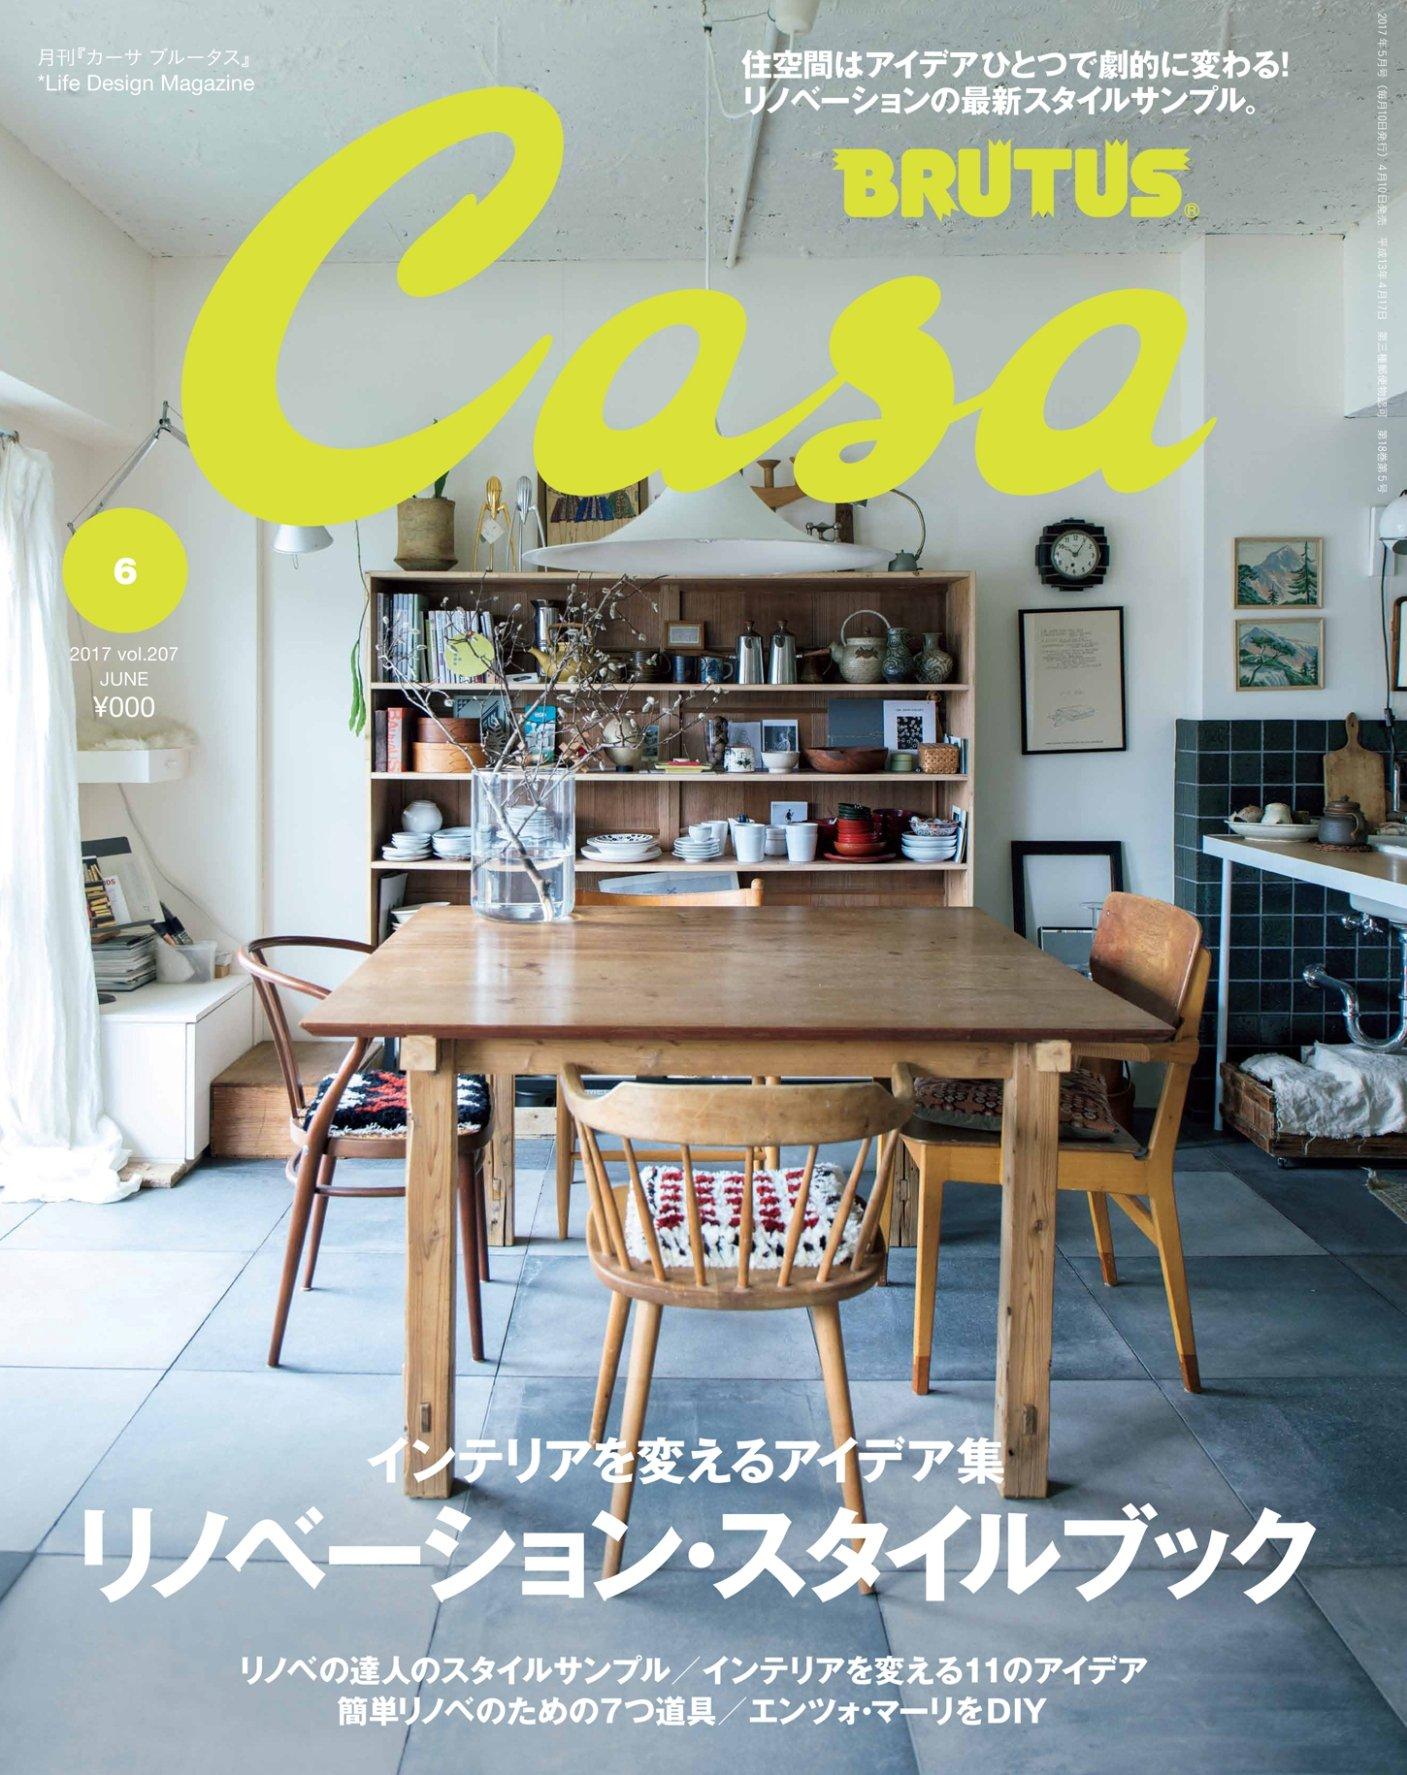 Casa BRUTUS Japanese Home Magazine JUNE 2017 Issue JAPANESE EDITION JUN 6 4910125410676 Amazon Books